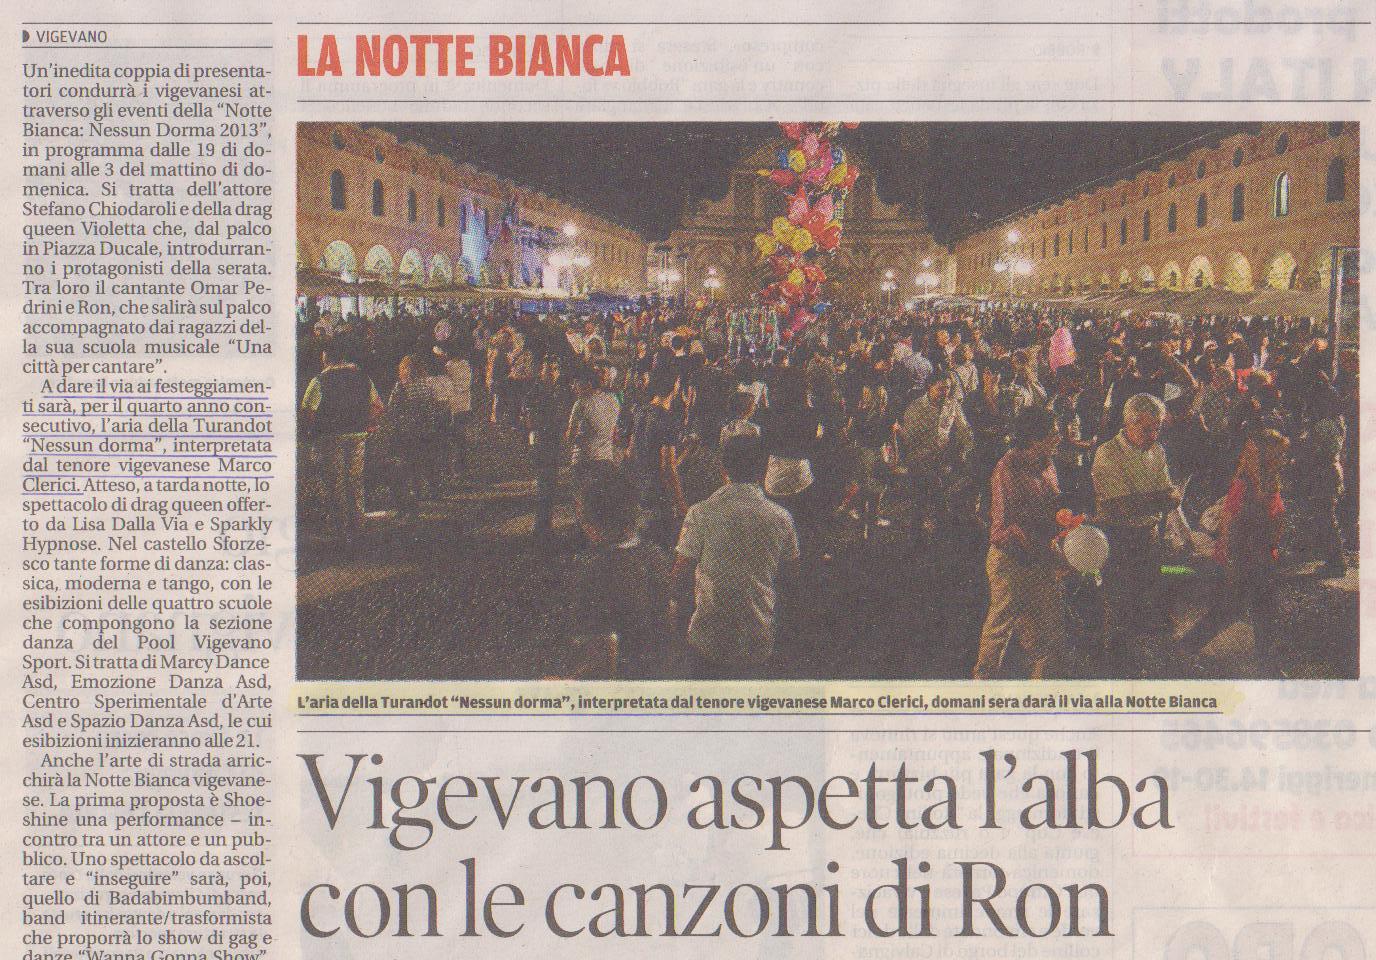 Notte Bianca 2013 a Vigevano Piazza Ducale